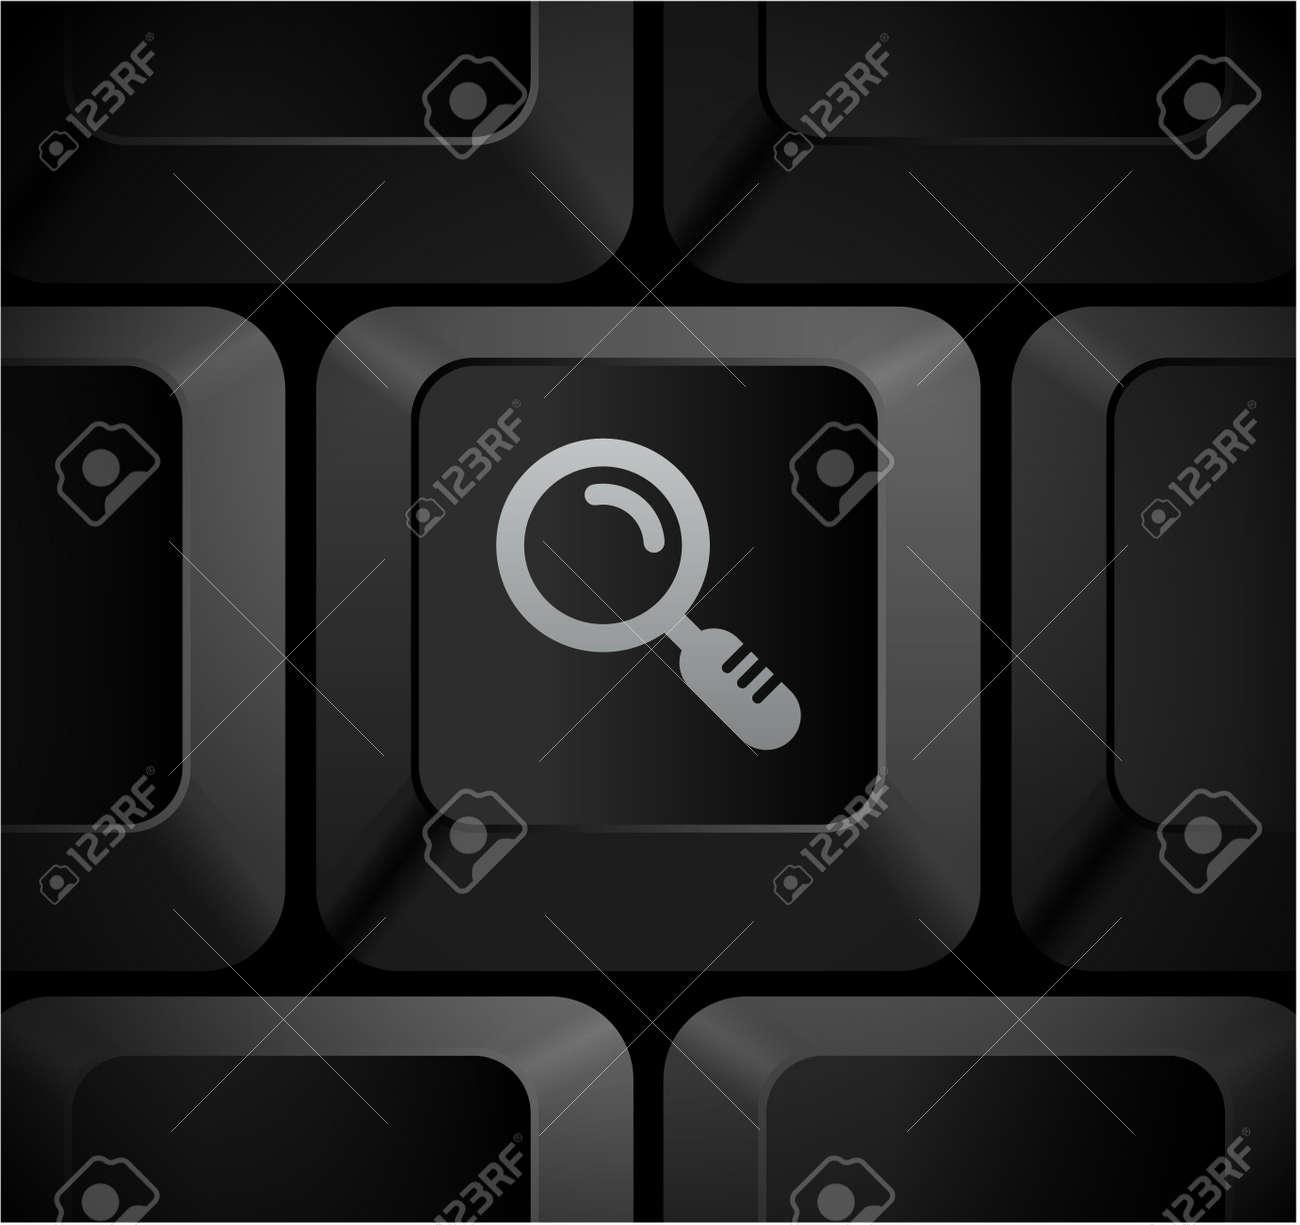 Magnifying Glass Icon on Computer KeyboardOriginal Illustration Stock Illustration - 7568220